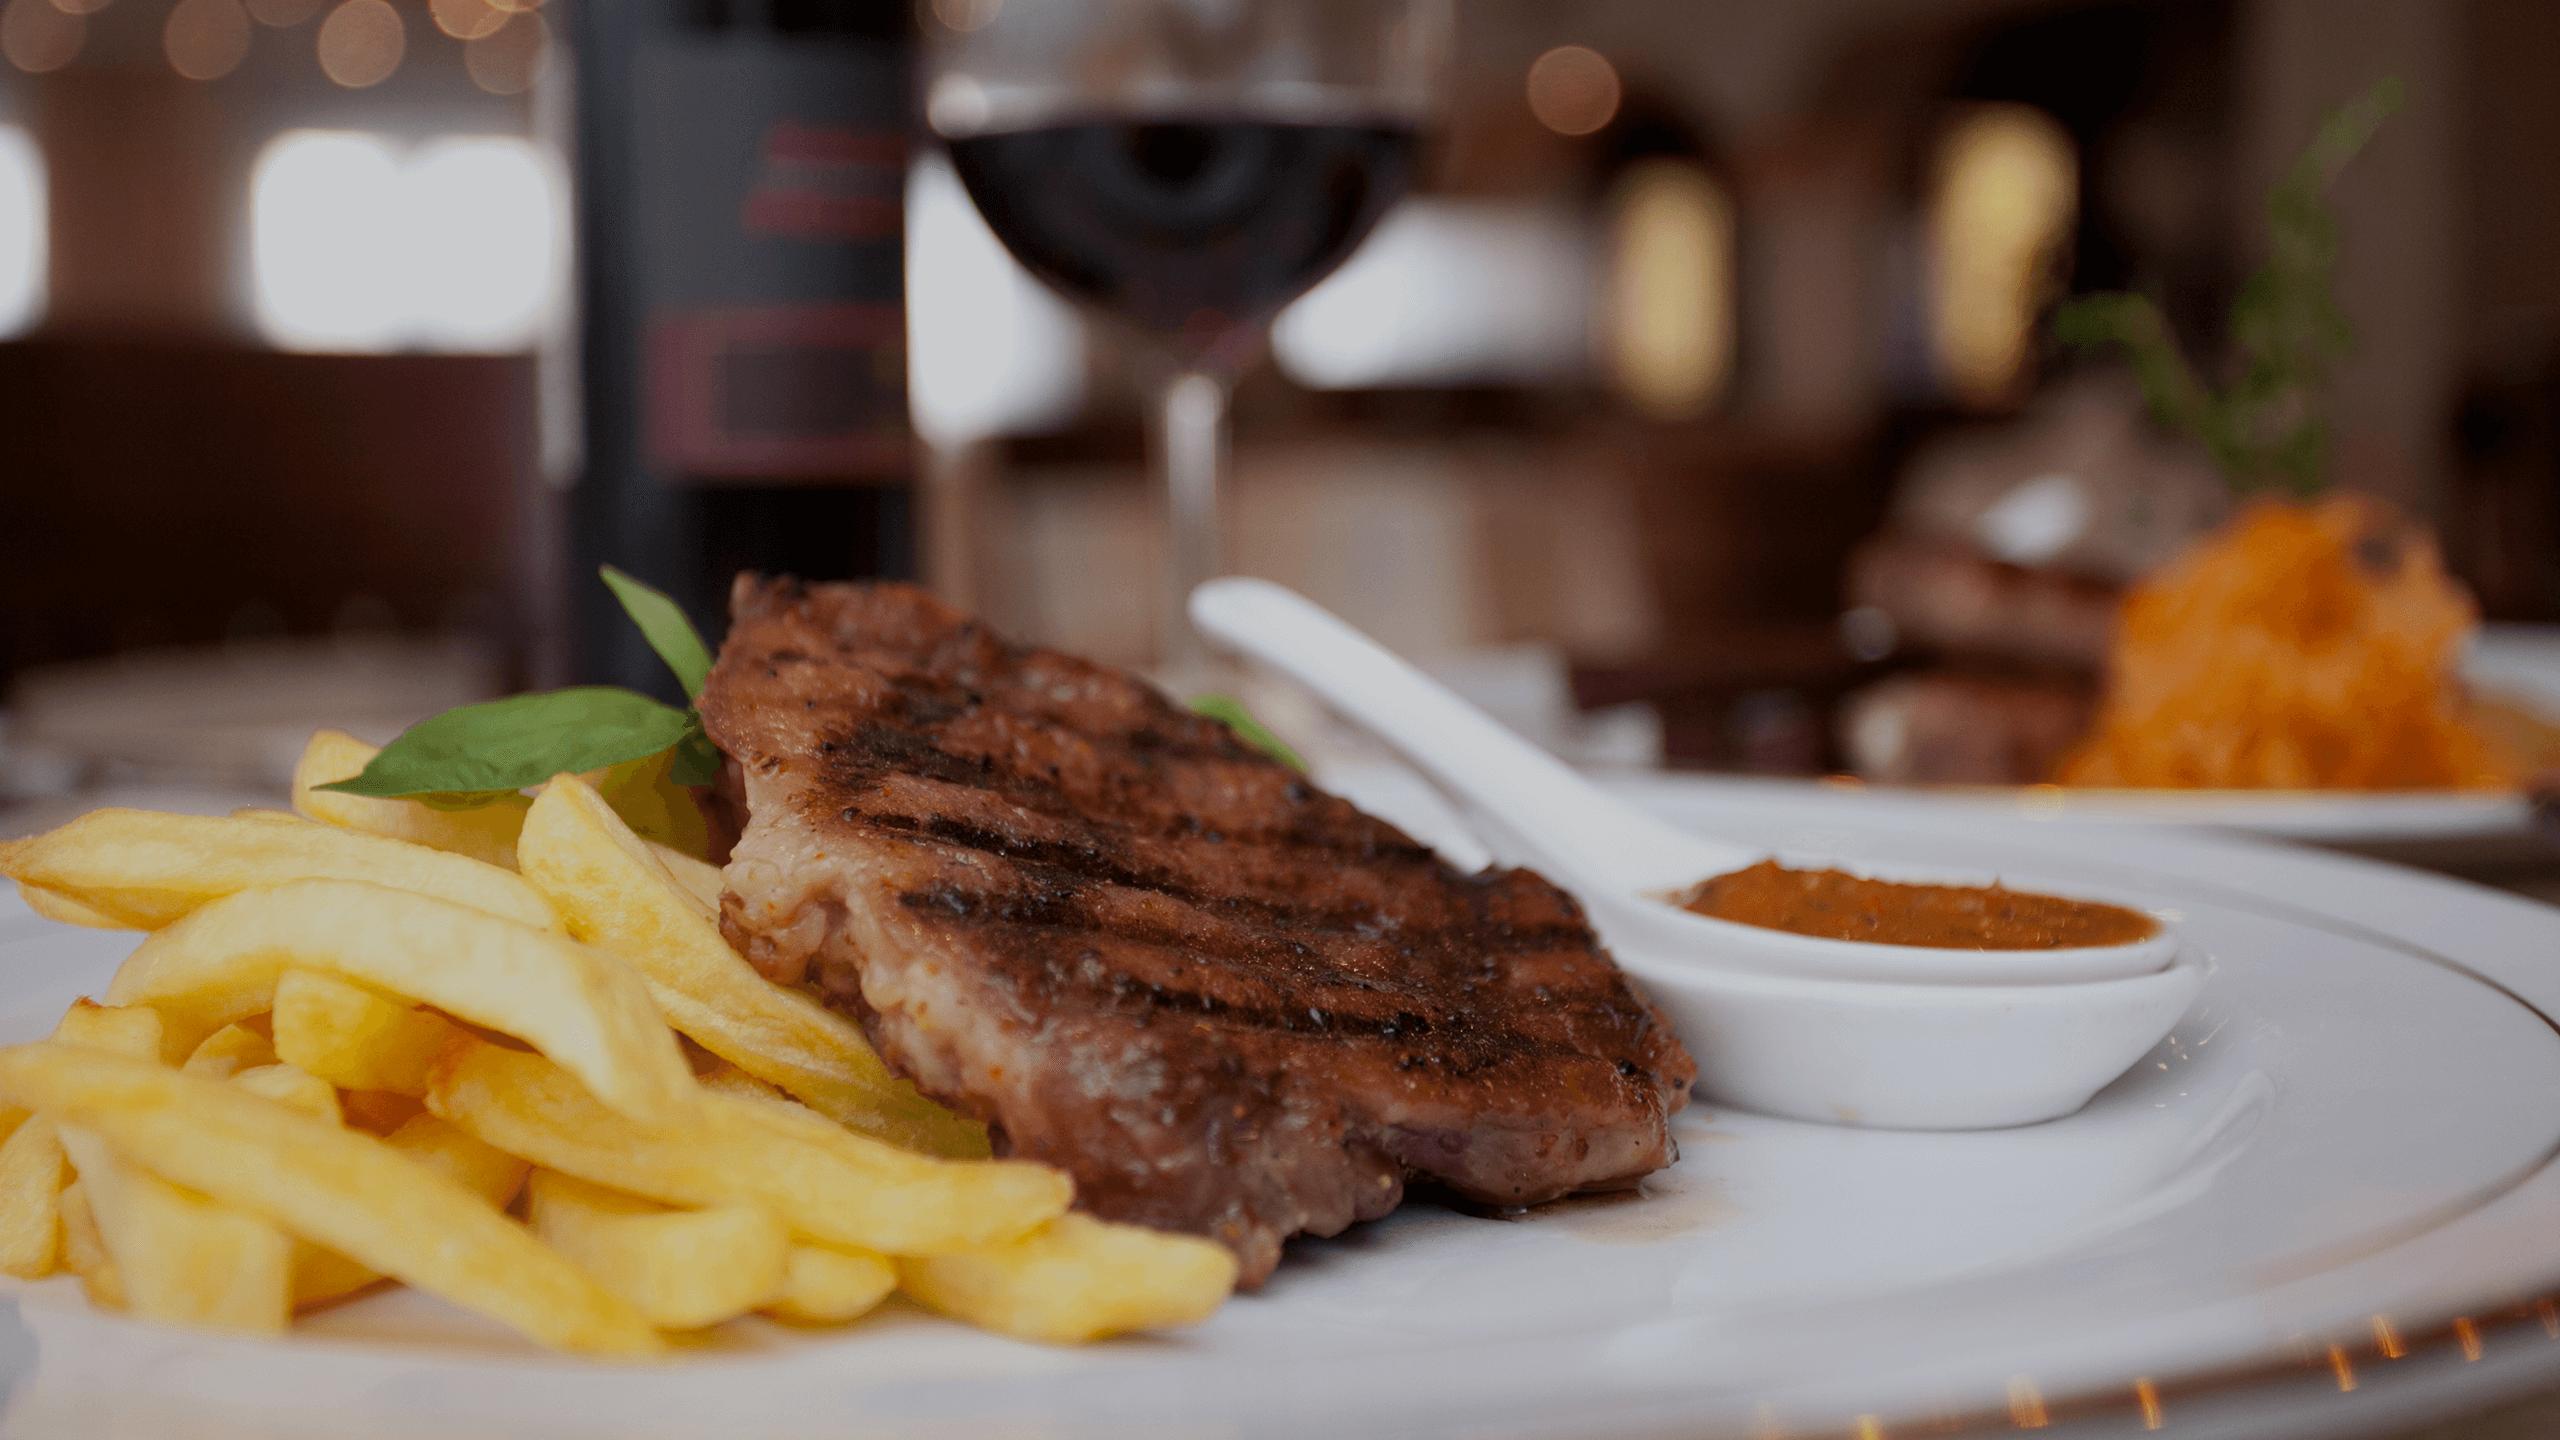 Steak and fries dinner